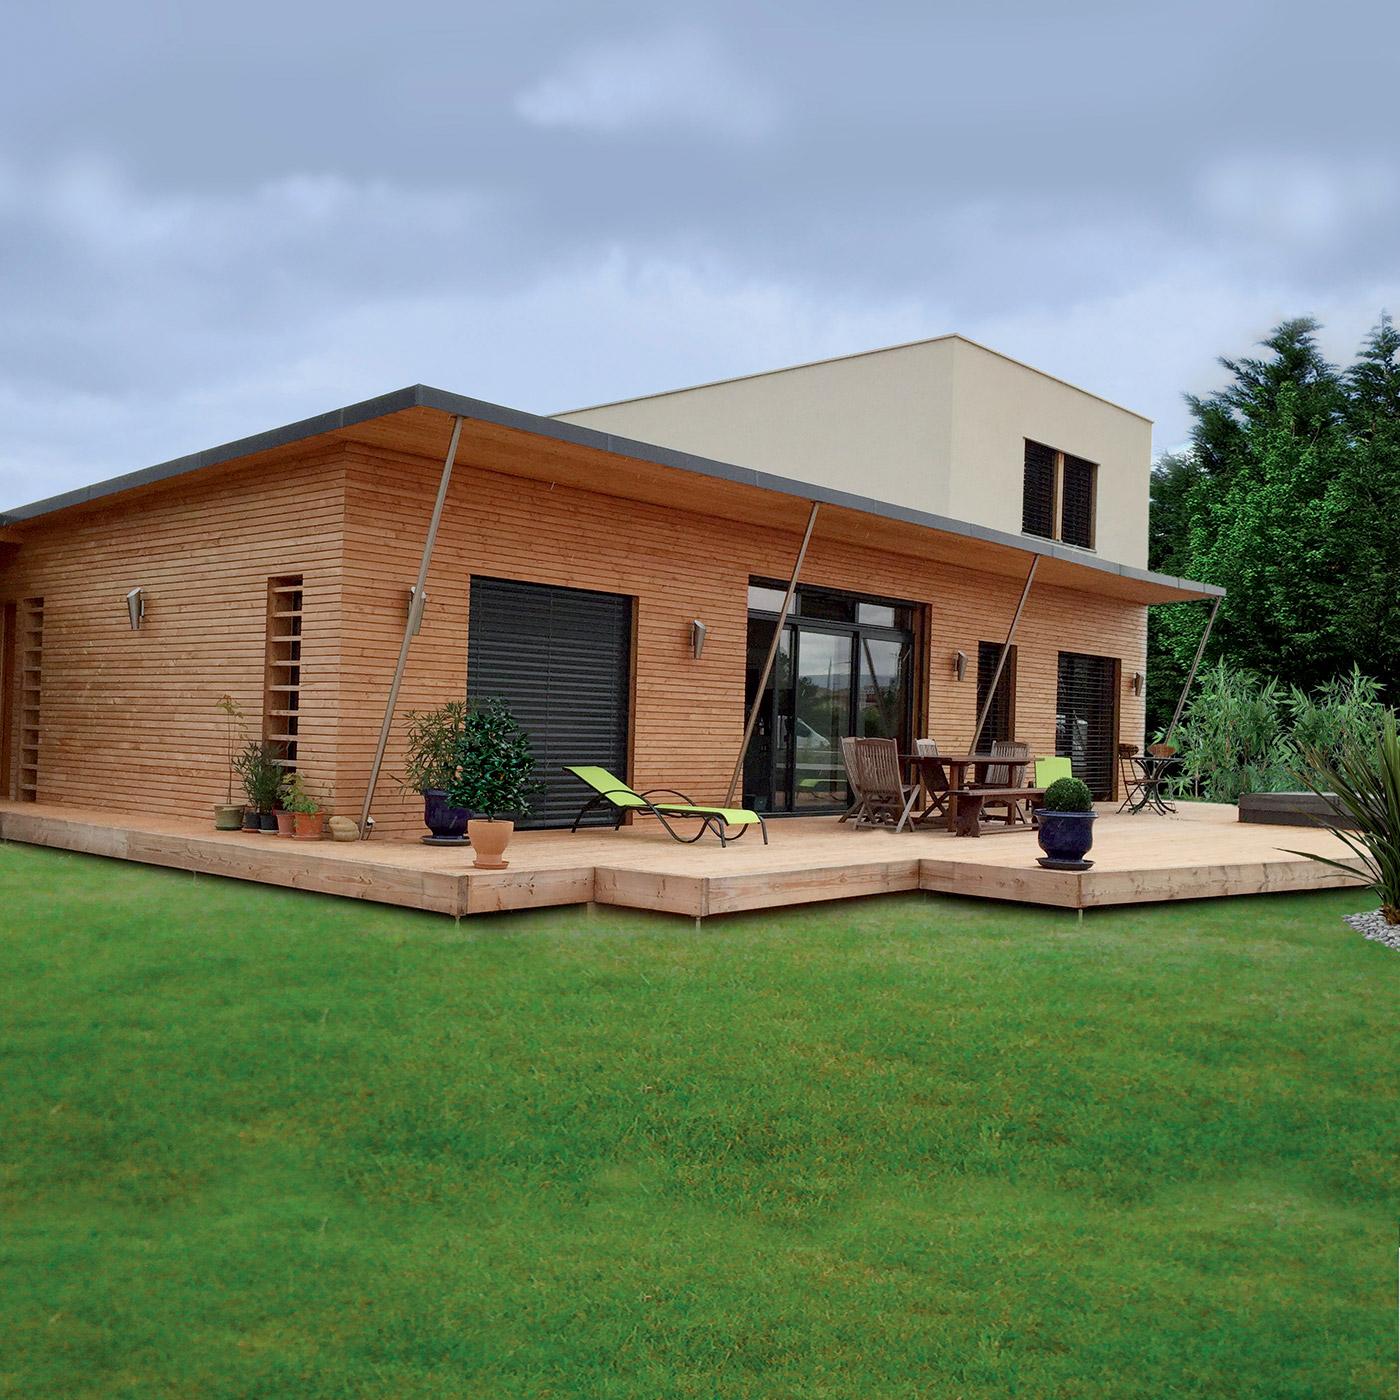 constructeur maison ossature bois morbihan ventana blog. Black Bedroom Furniture Sets. Home Design Ideas